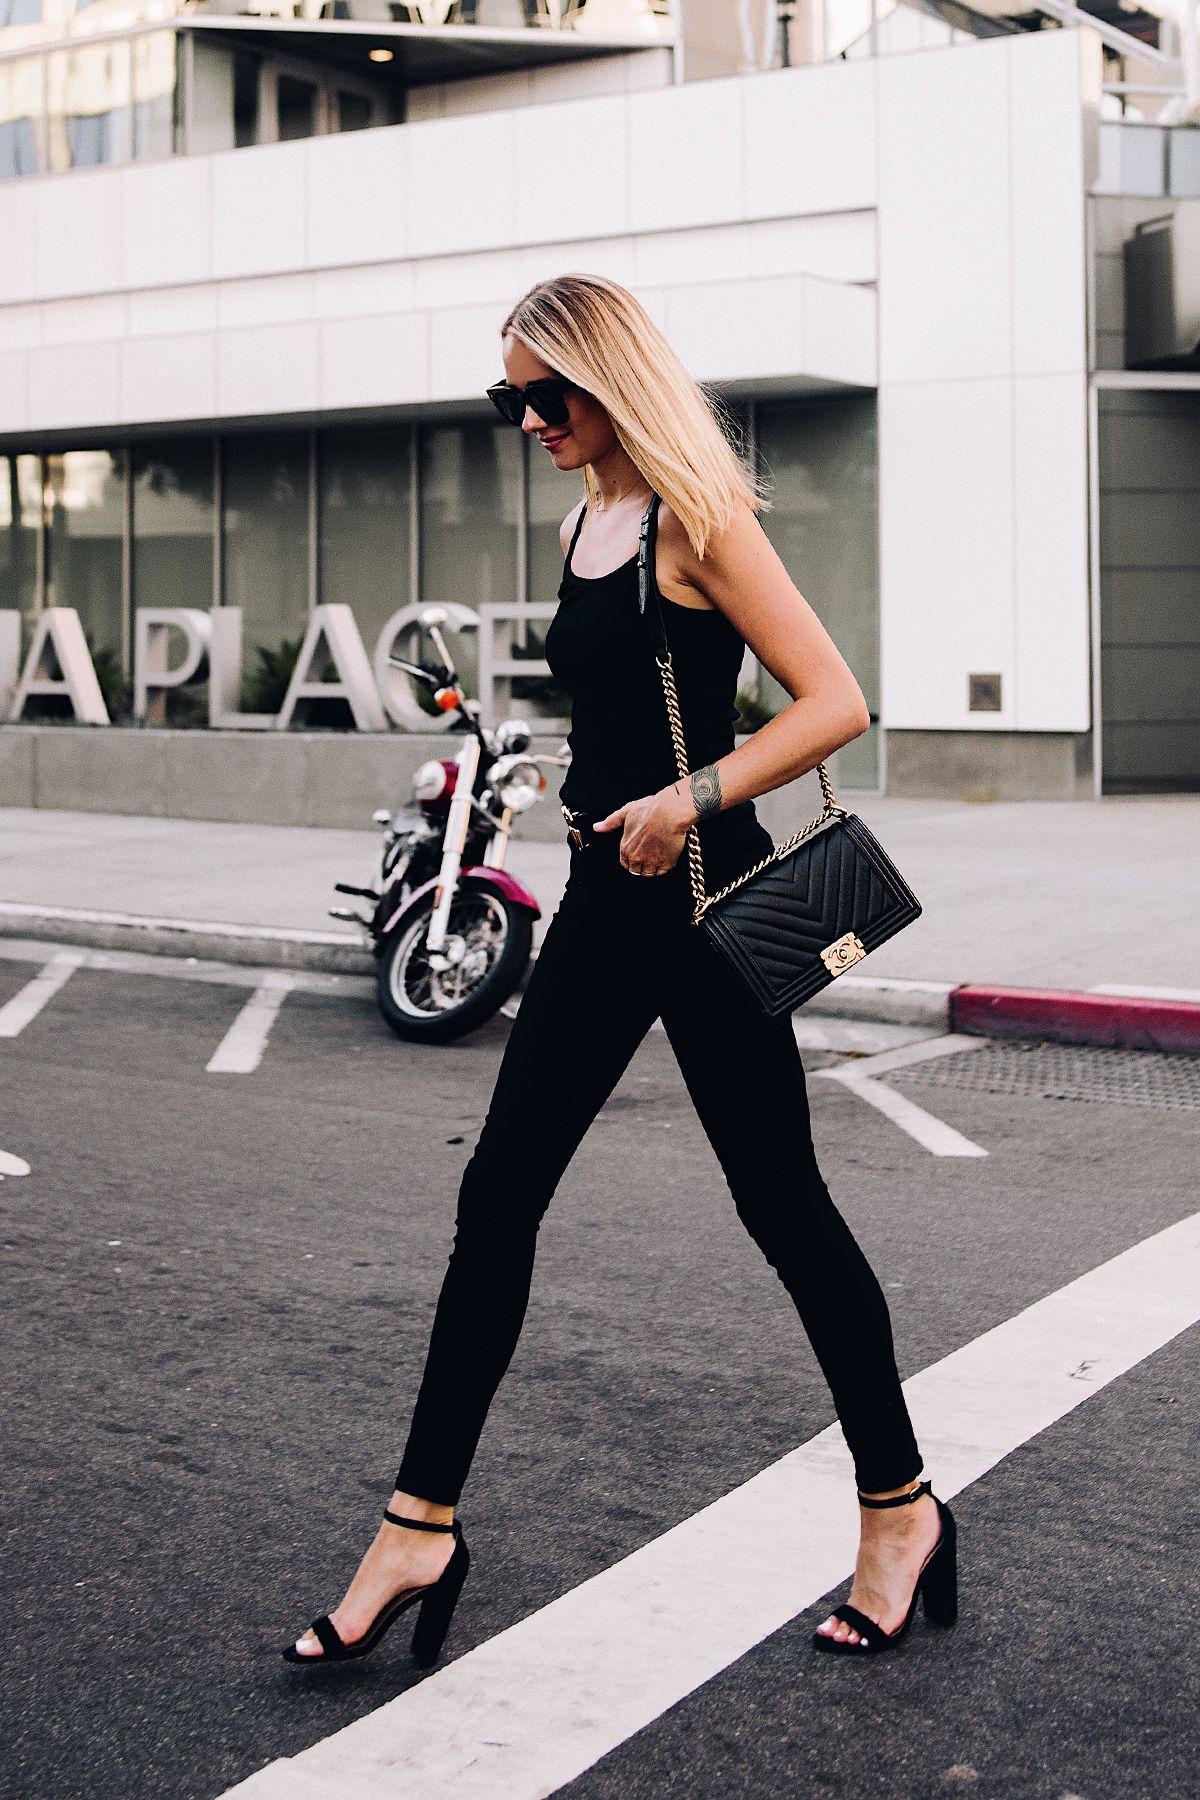 b6145e671ea8 Blonde Woman Wearing Topshop Black Tank Black Skinny Jeans Black Ankle  Strap Heeled Sandals Chanel Boy Bag BlackFashion Jackson San Diego Blogger  Fashion ...